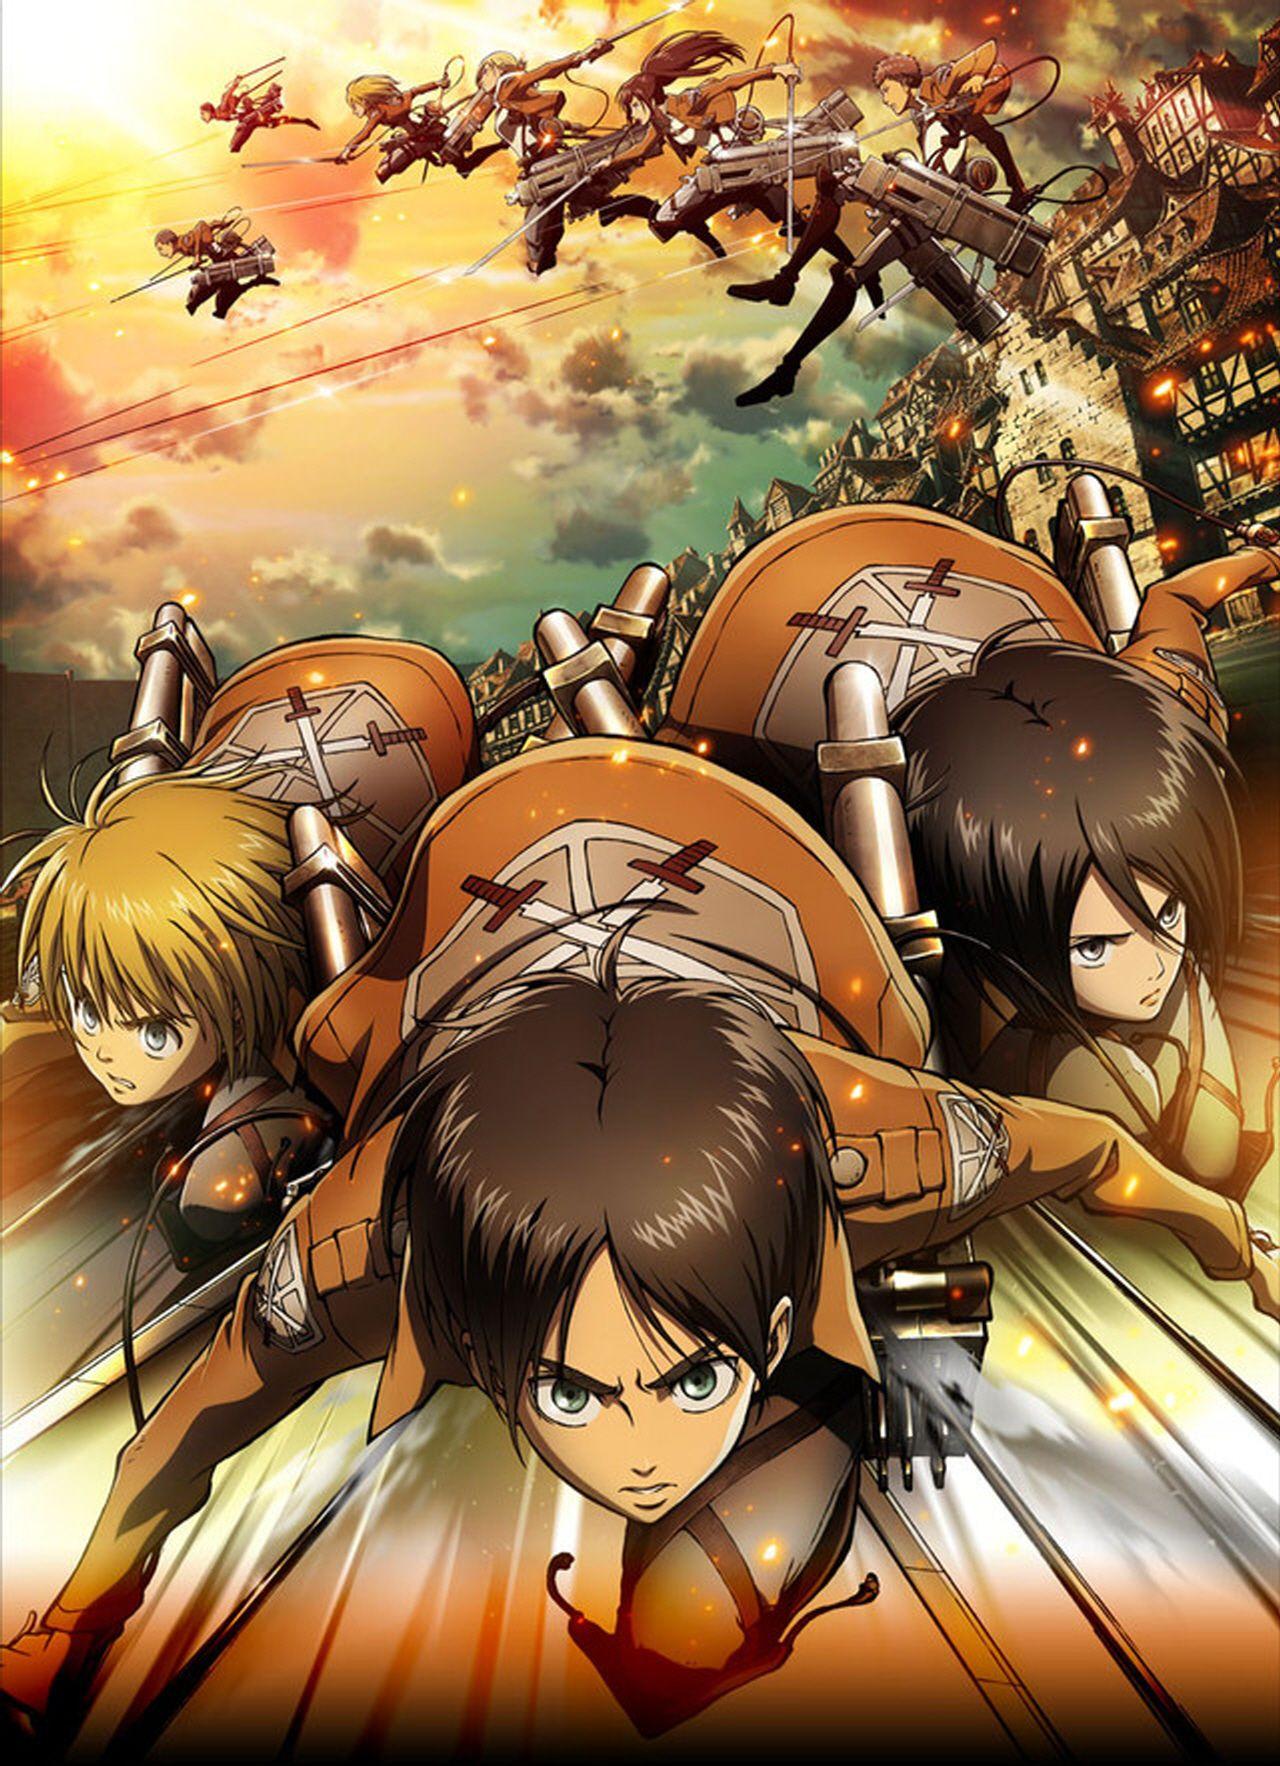 Shingeki No Kyojin Temporada 1 25 25 Japones Castellano Sub Espanol Mega Mediafire Drive In 2021 Attack On Titan Season Anime Titans Anime